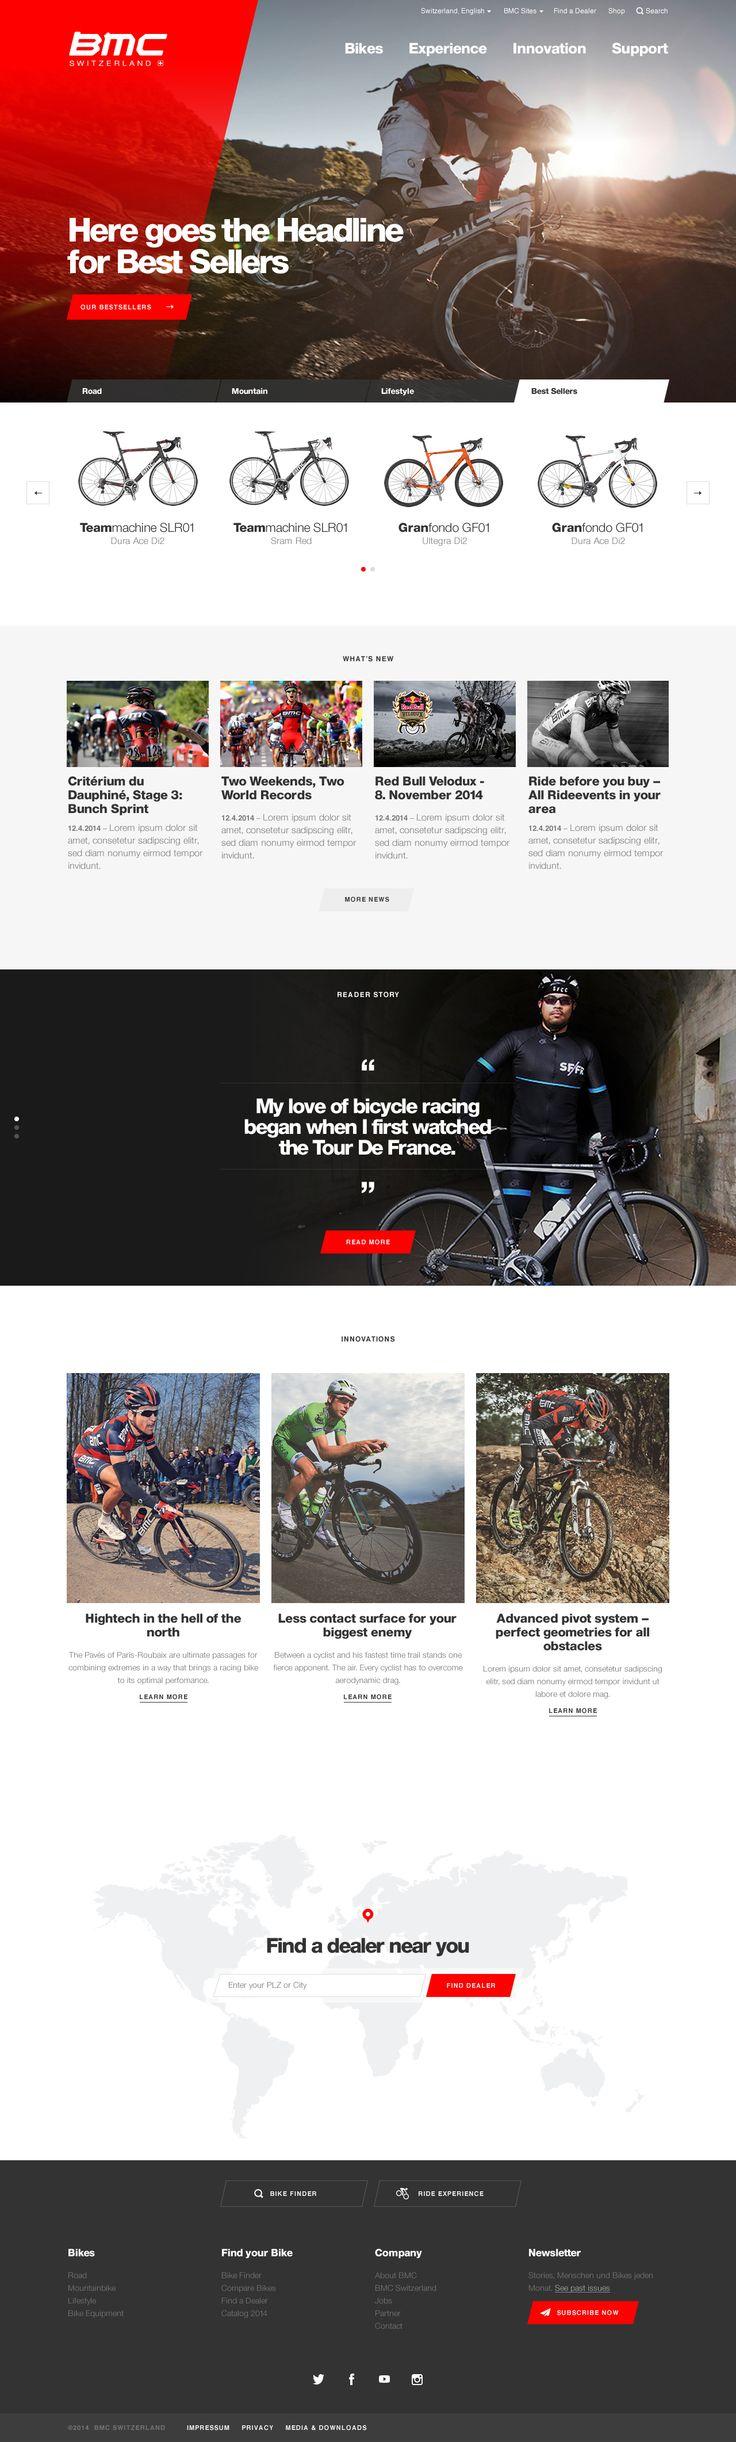 BMC - Relaunch Website BMC Switzerland AG  #webdesign #hinderlingvolkart #design #indentity #ux #ui  http://www.hinderlingvolkart.com/de/projekte/detail/bmc-rlaunch-website.html